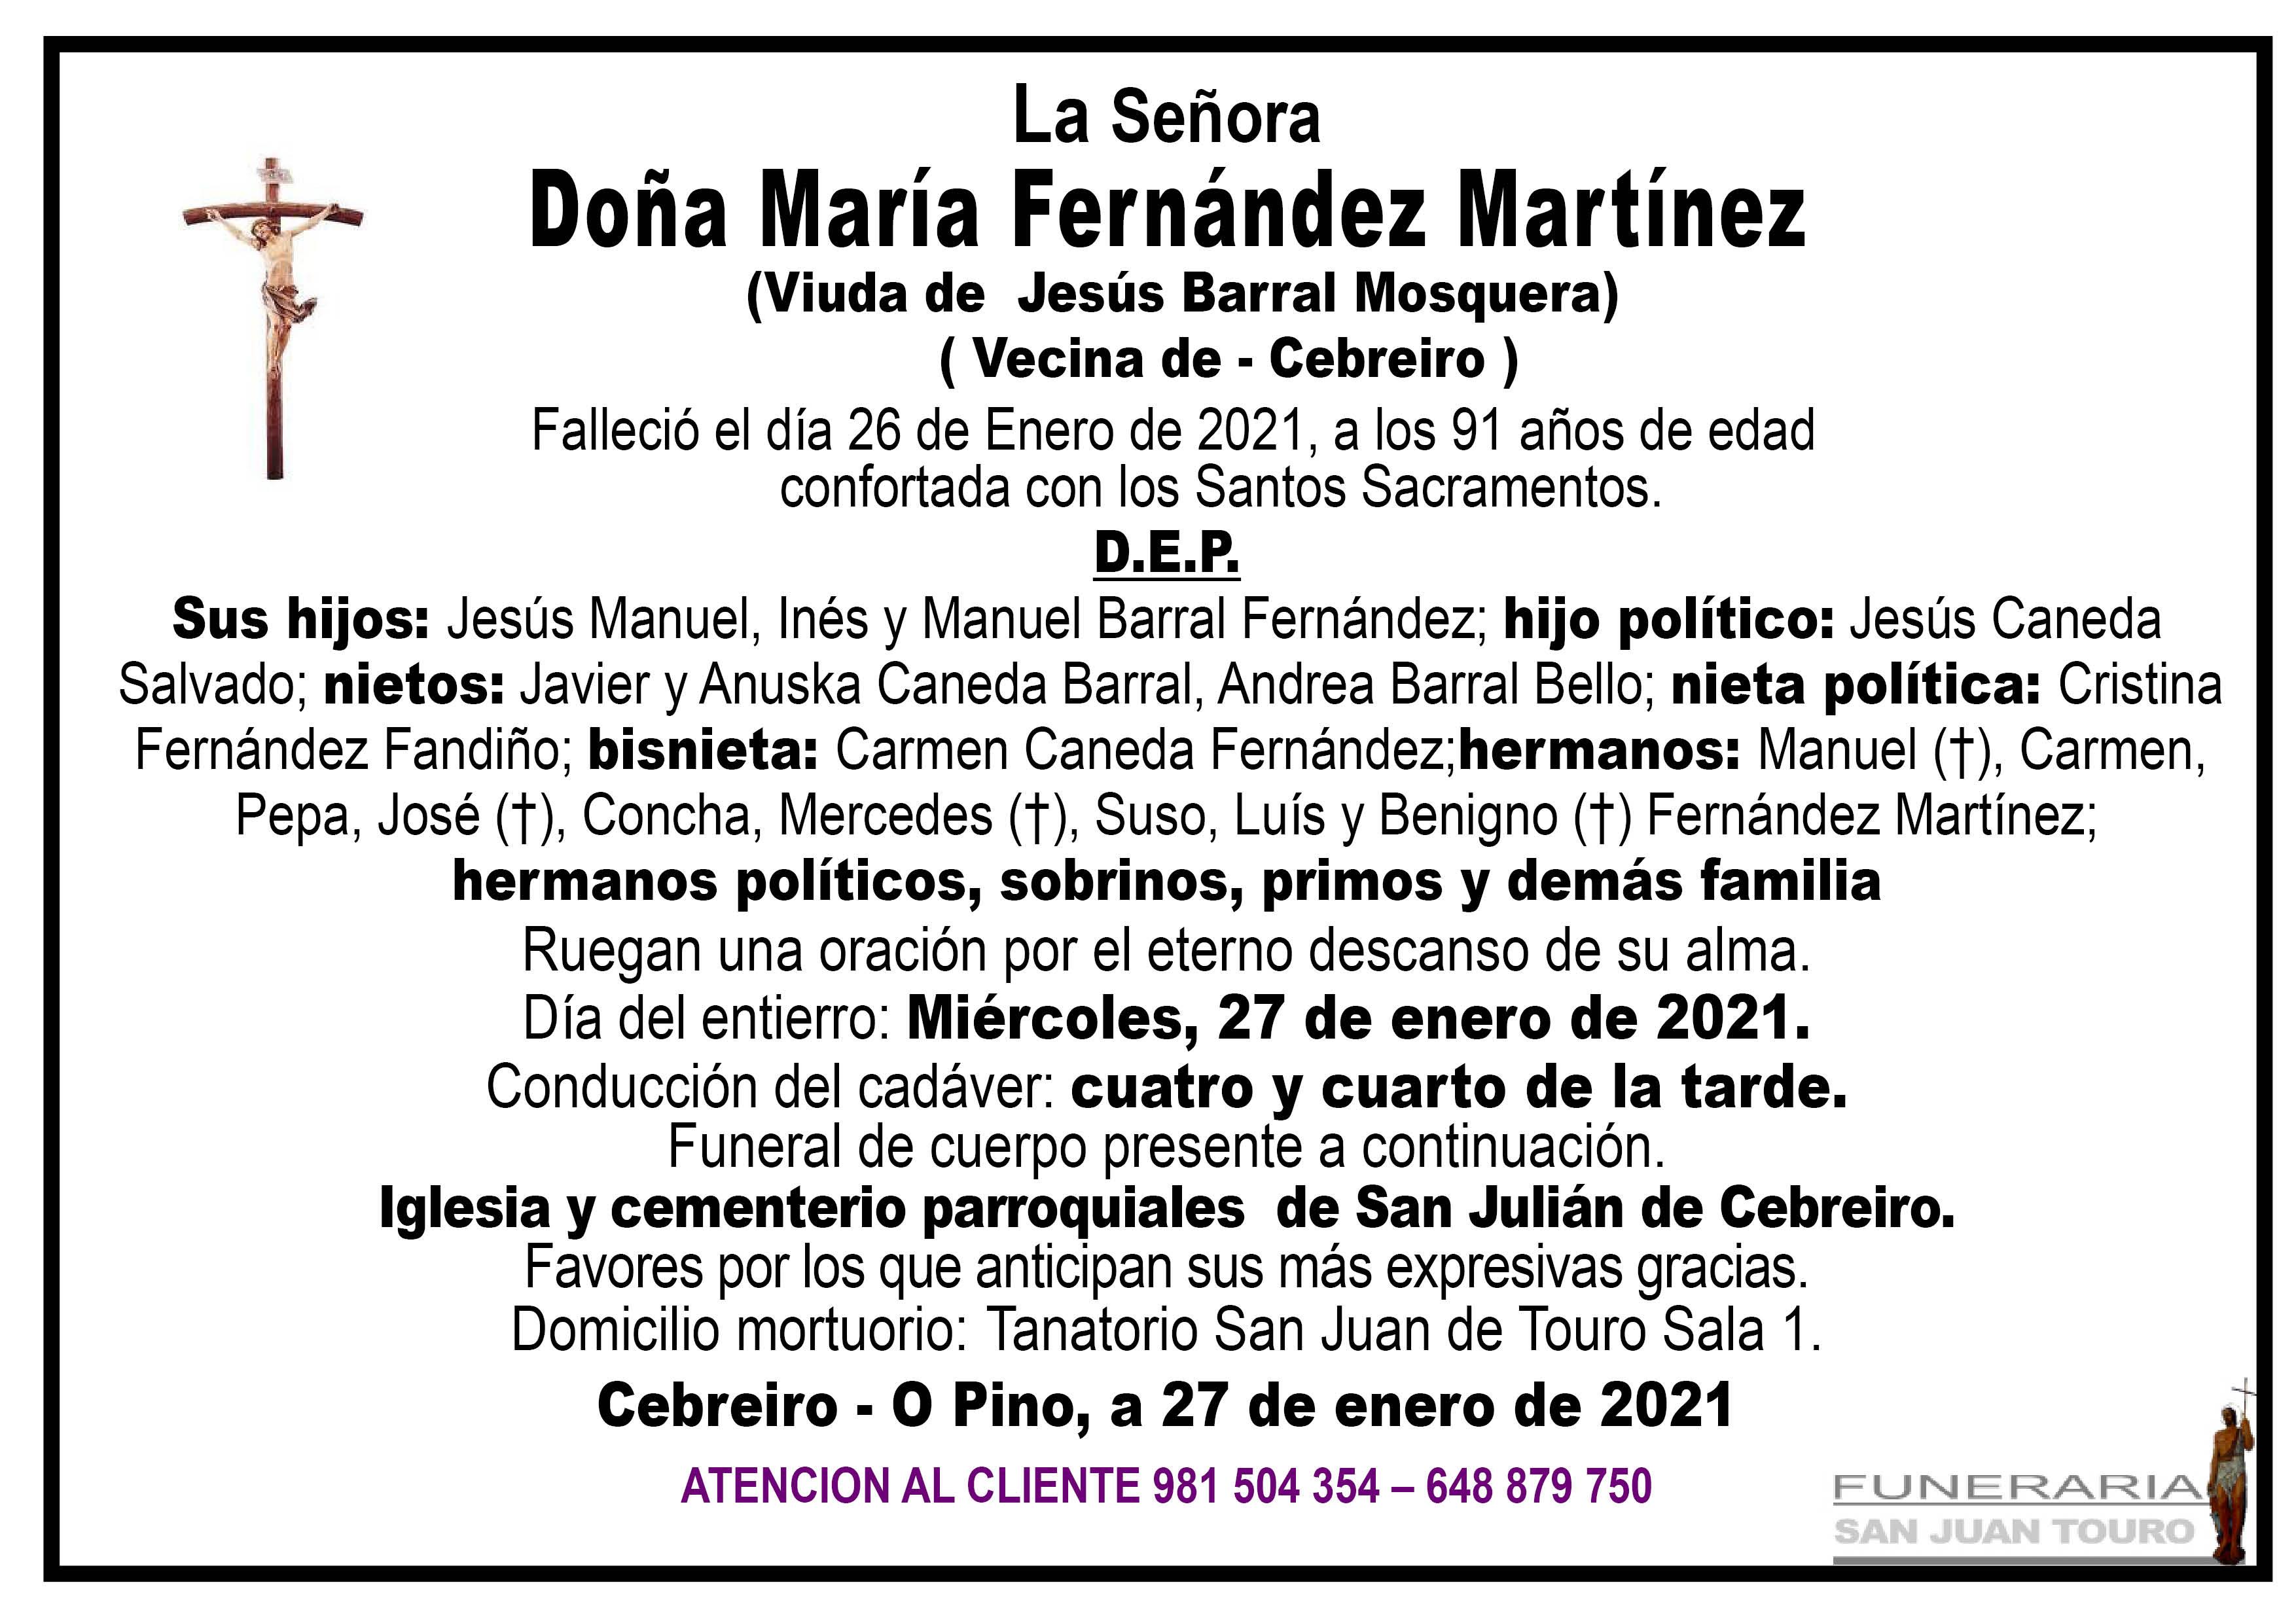 Esquela de SEPELIO DE DOÑA MARÍA FERNÁNDEZ MARTÍNEZ